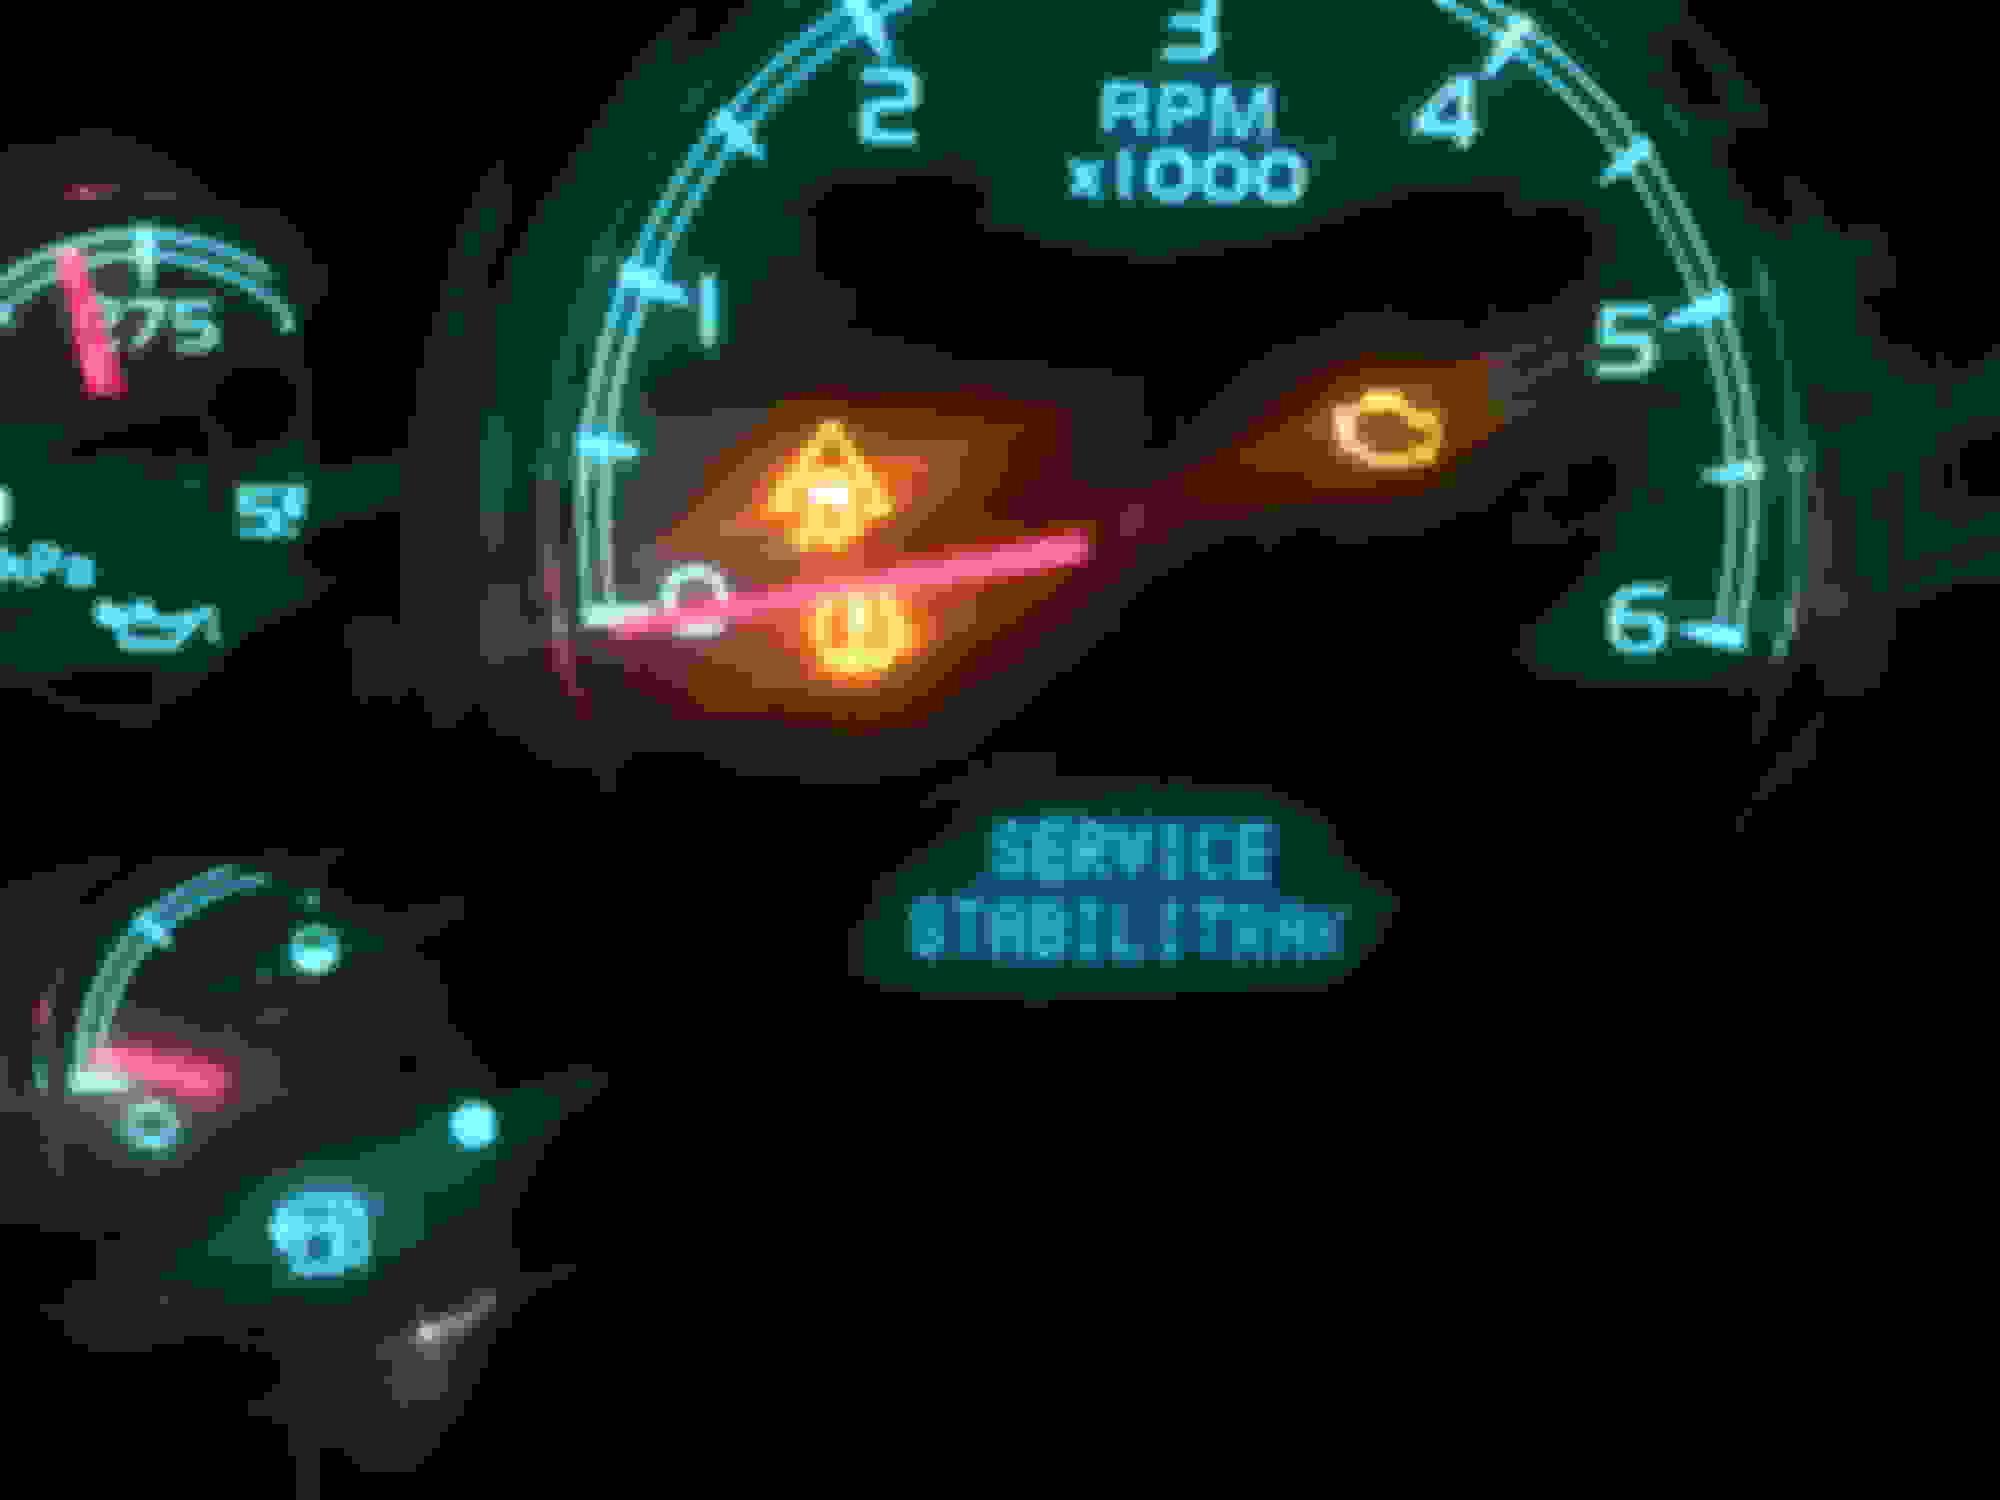 Service stabilitrak/ traction control - Chevrolet Forum